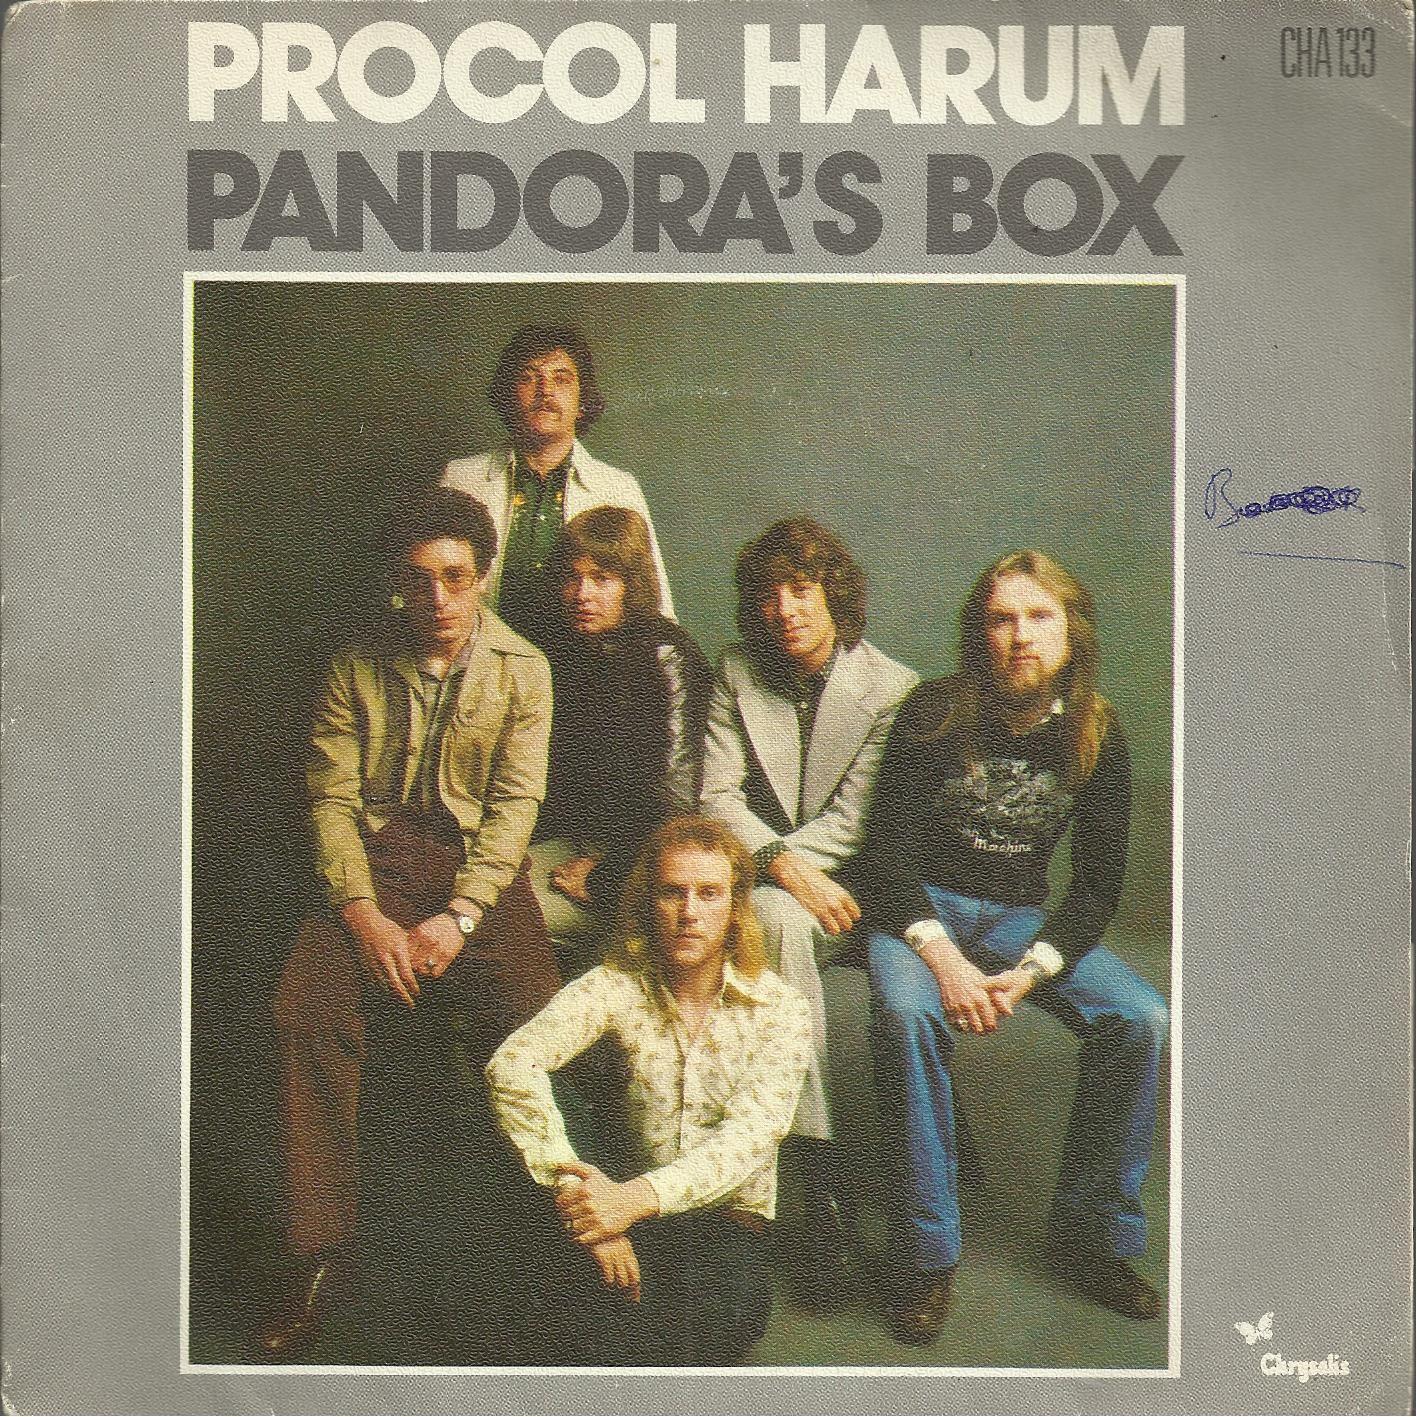 Pandora's Box 3'33 (K. Reid - G. Brooker) / Piper's Tune 4'23 (K. Reid - G. Brooker) - Procol Harum